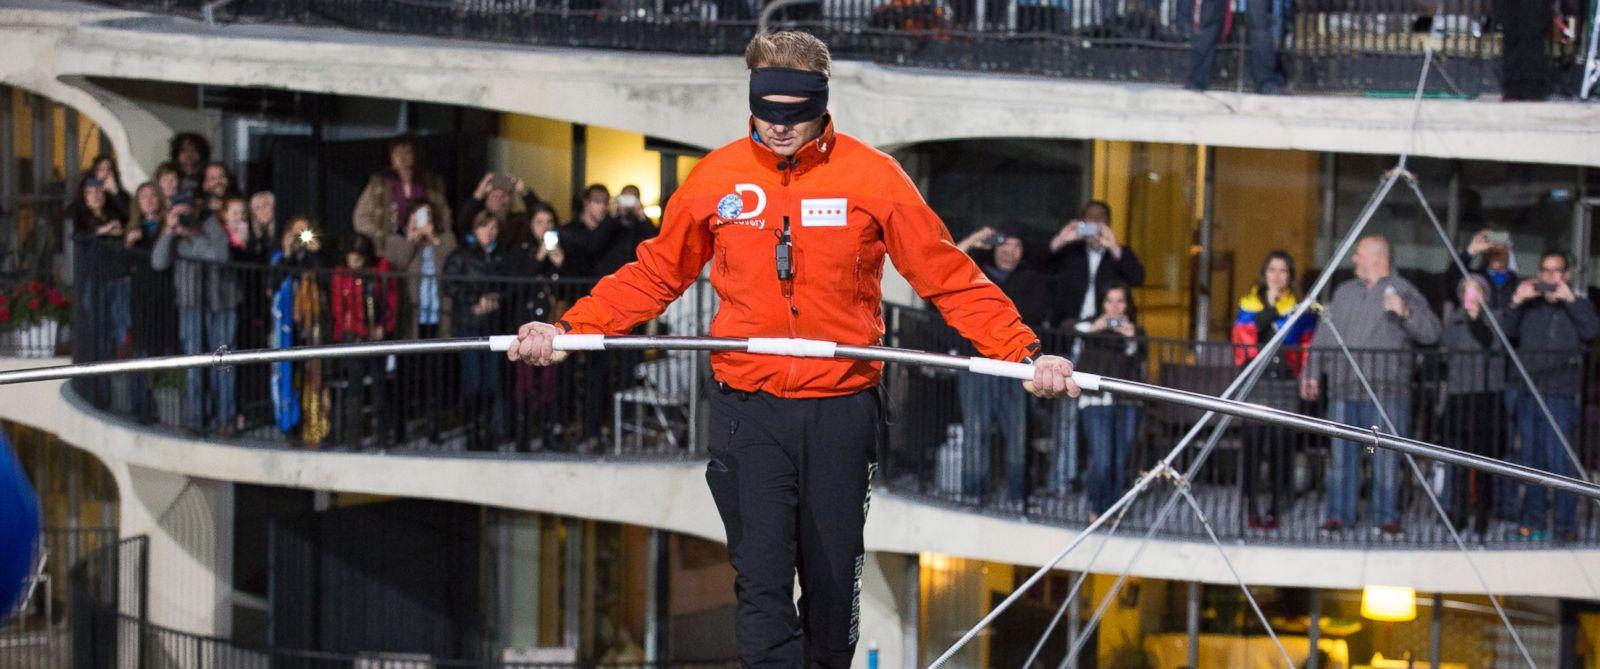 PHOTO: Nik Wallenda walks across the Chicago skyline blindfolded for Discovery Channels Skyscraper Live with Nik Wallenda, Nov. 2, 2014.